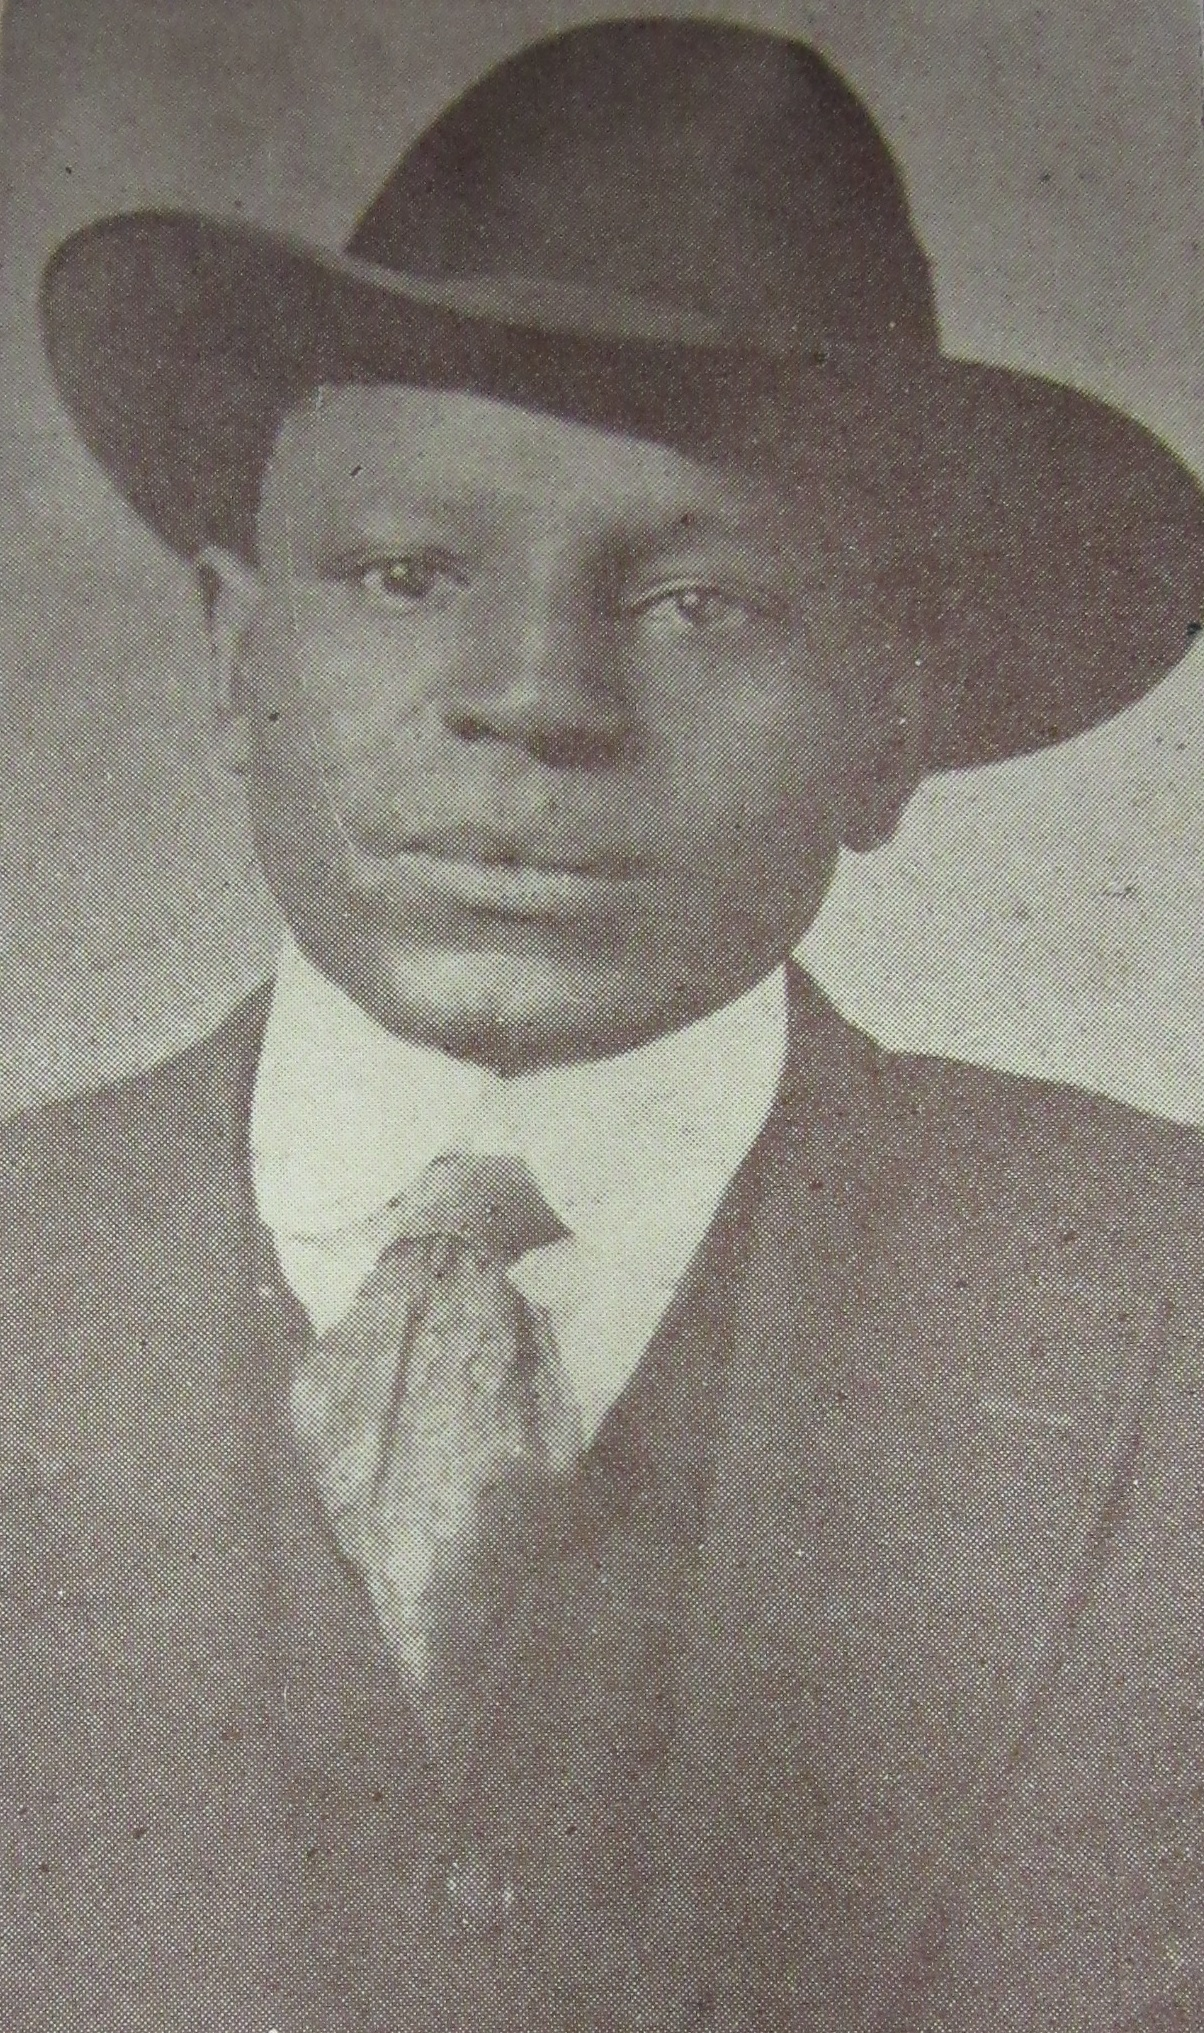 Obadiah B. Smith, Jr.